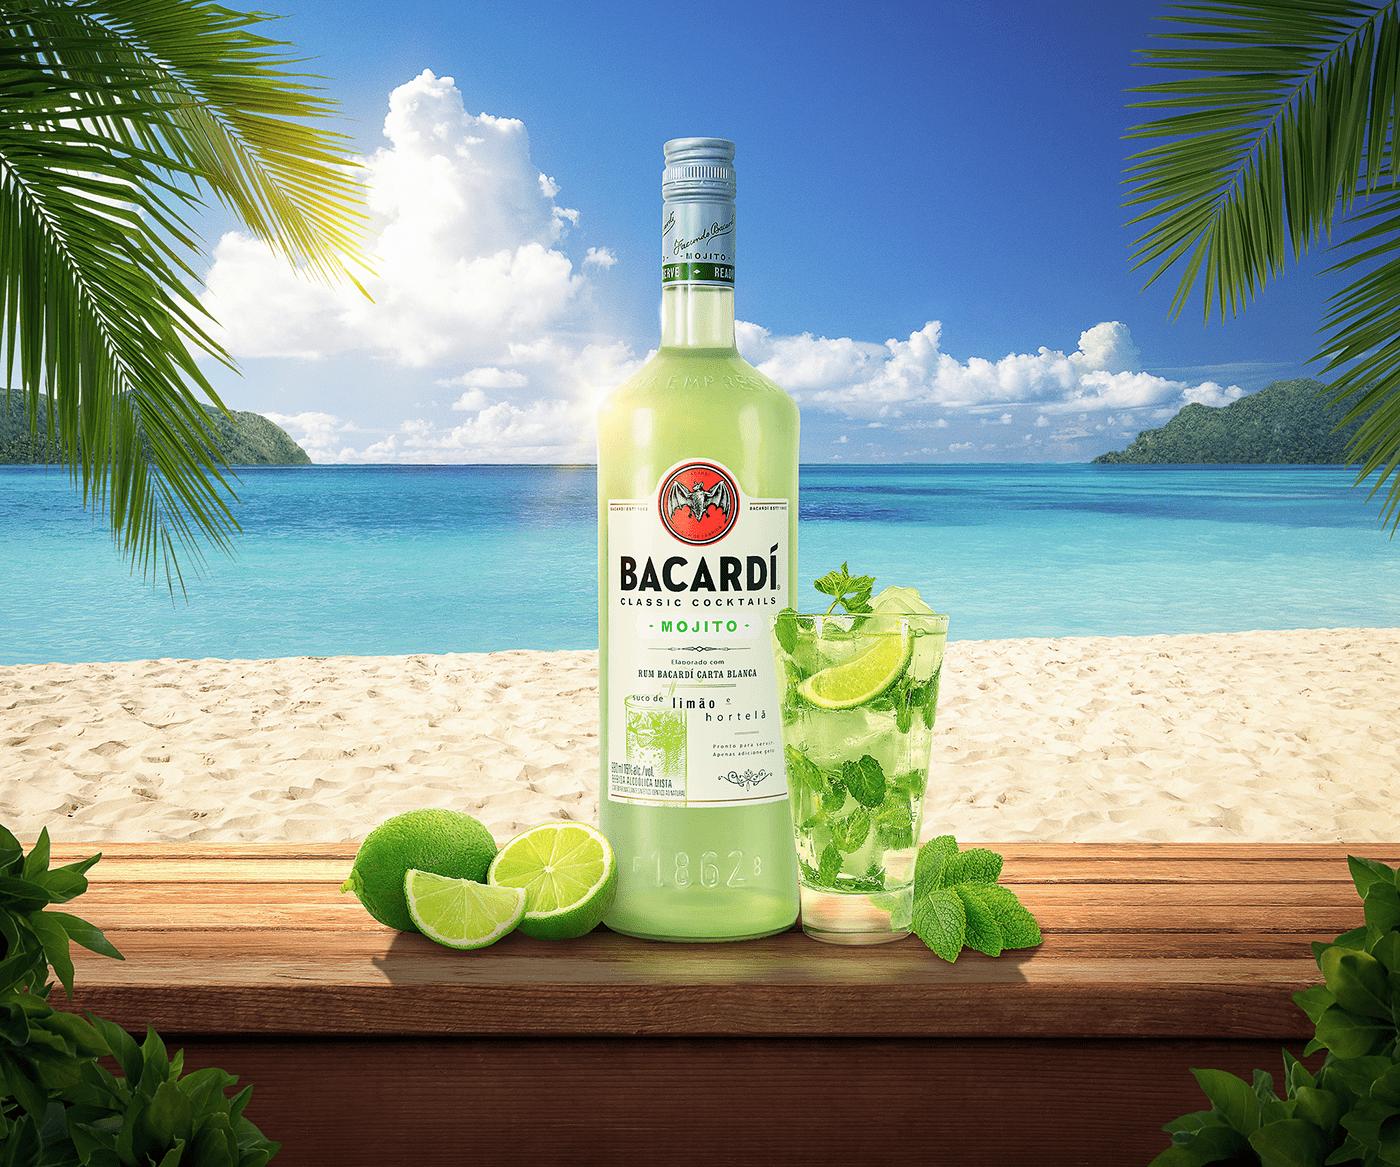 Готовый Bacardi Mojito в бутылке